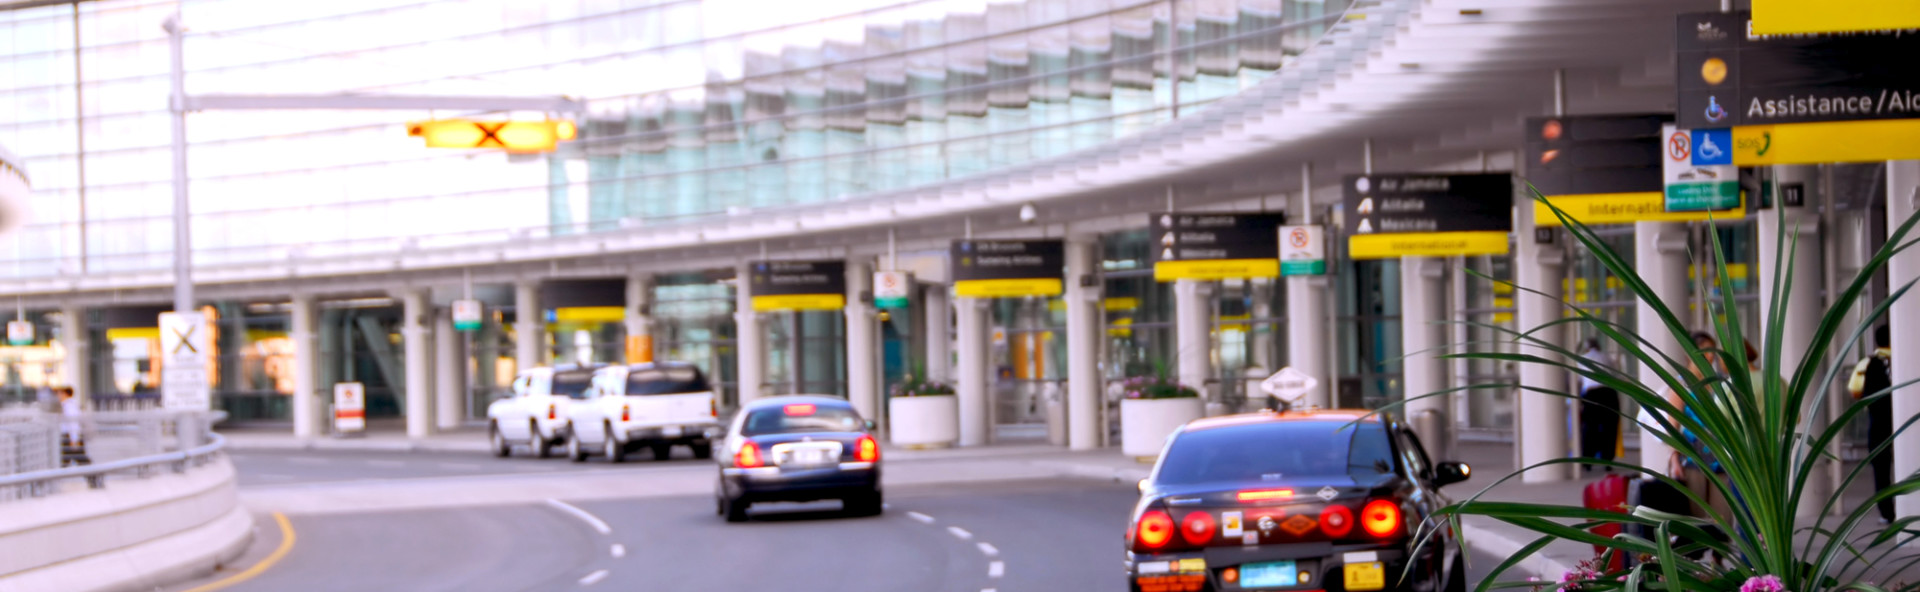 cleveland airport transportation services